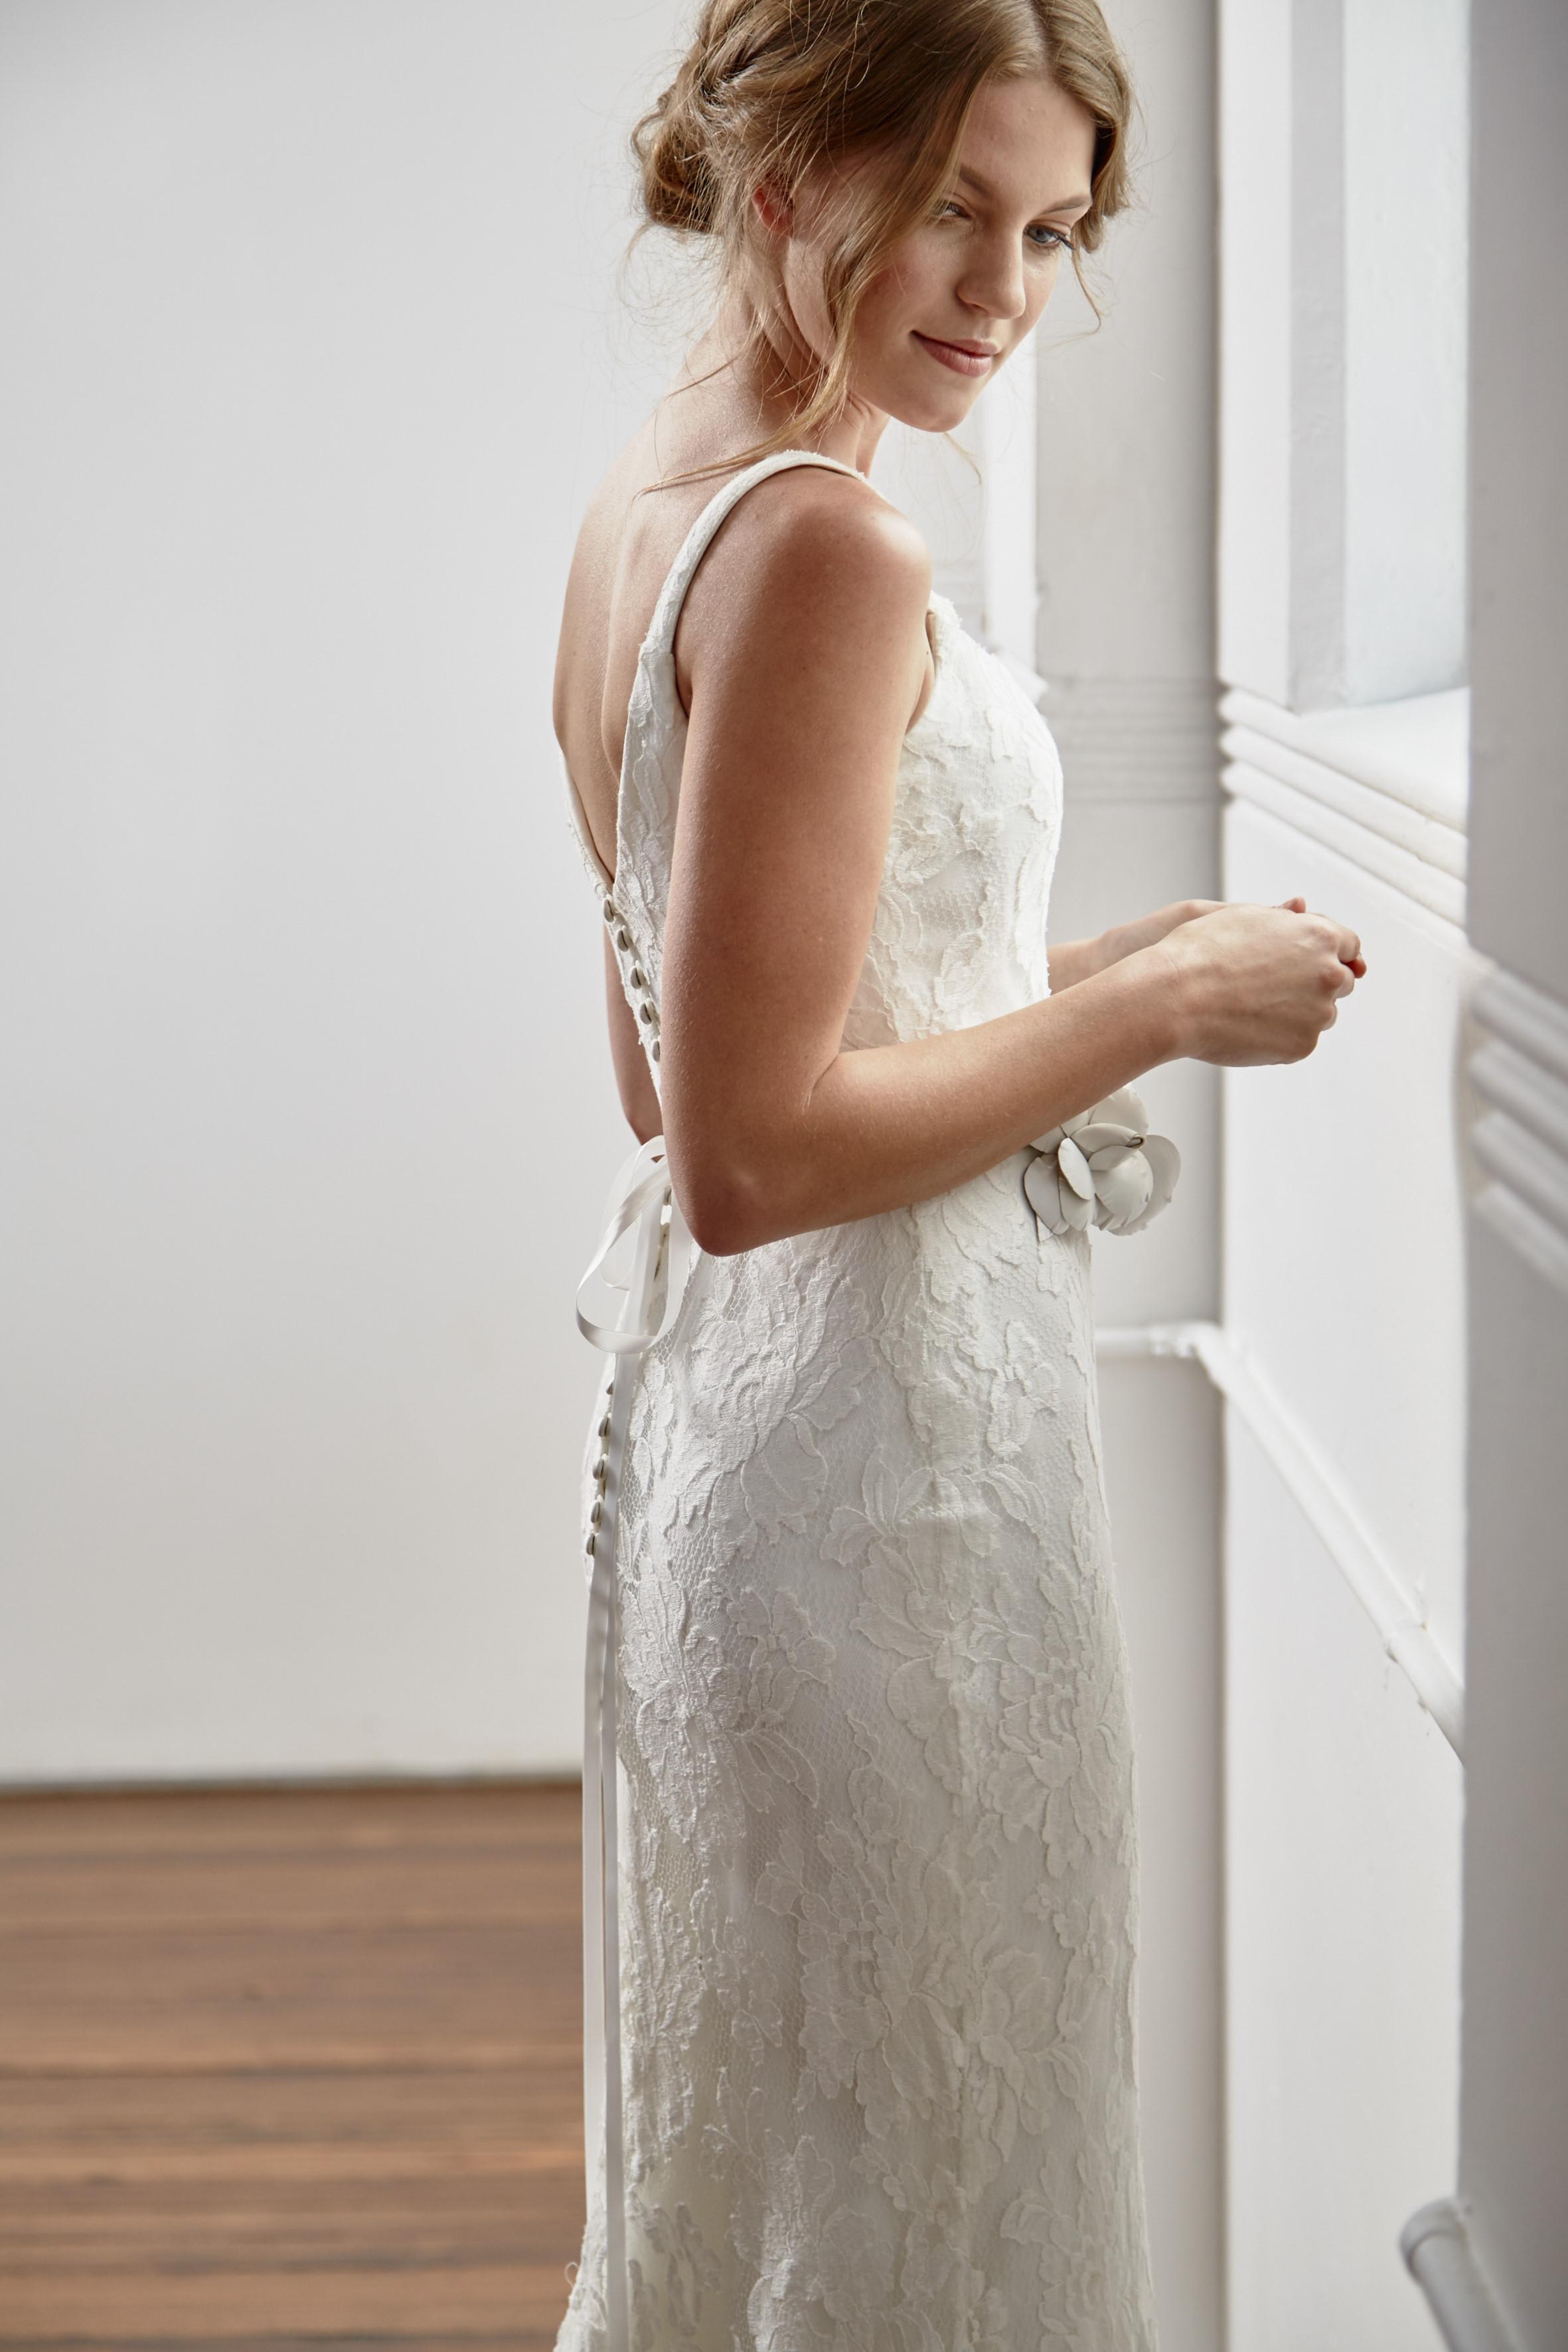 Summer bridal gown Tanya Anic Bridal photographyGrant Sparkes Carroll double bay sydney bridal_170_028ut.jpg